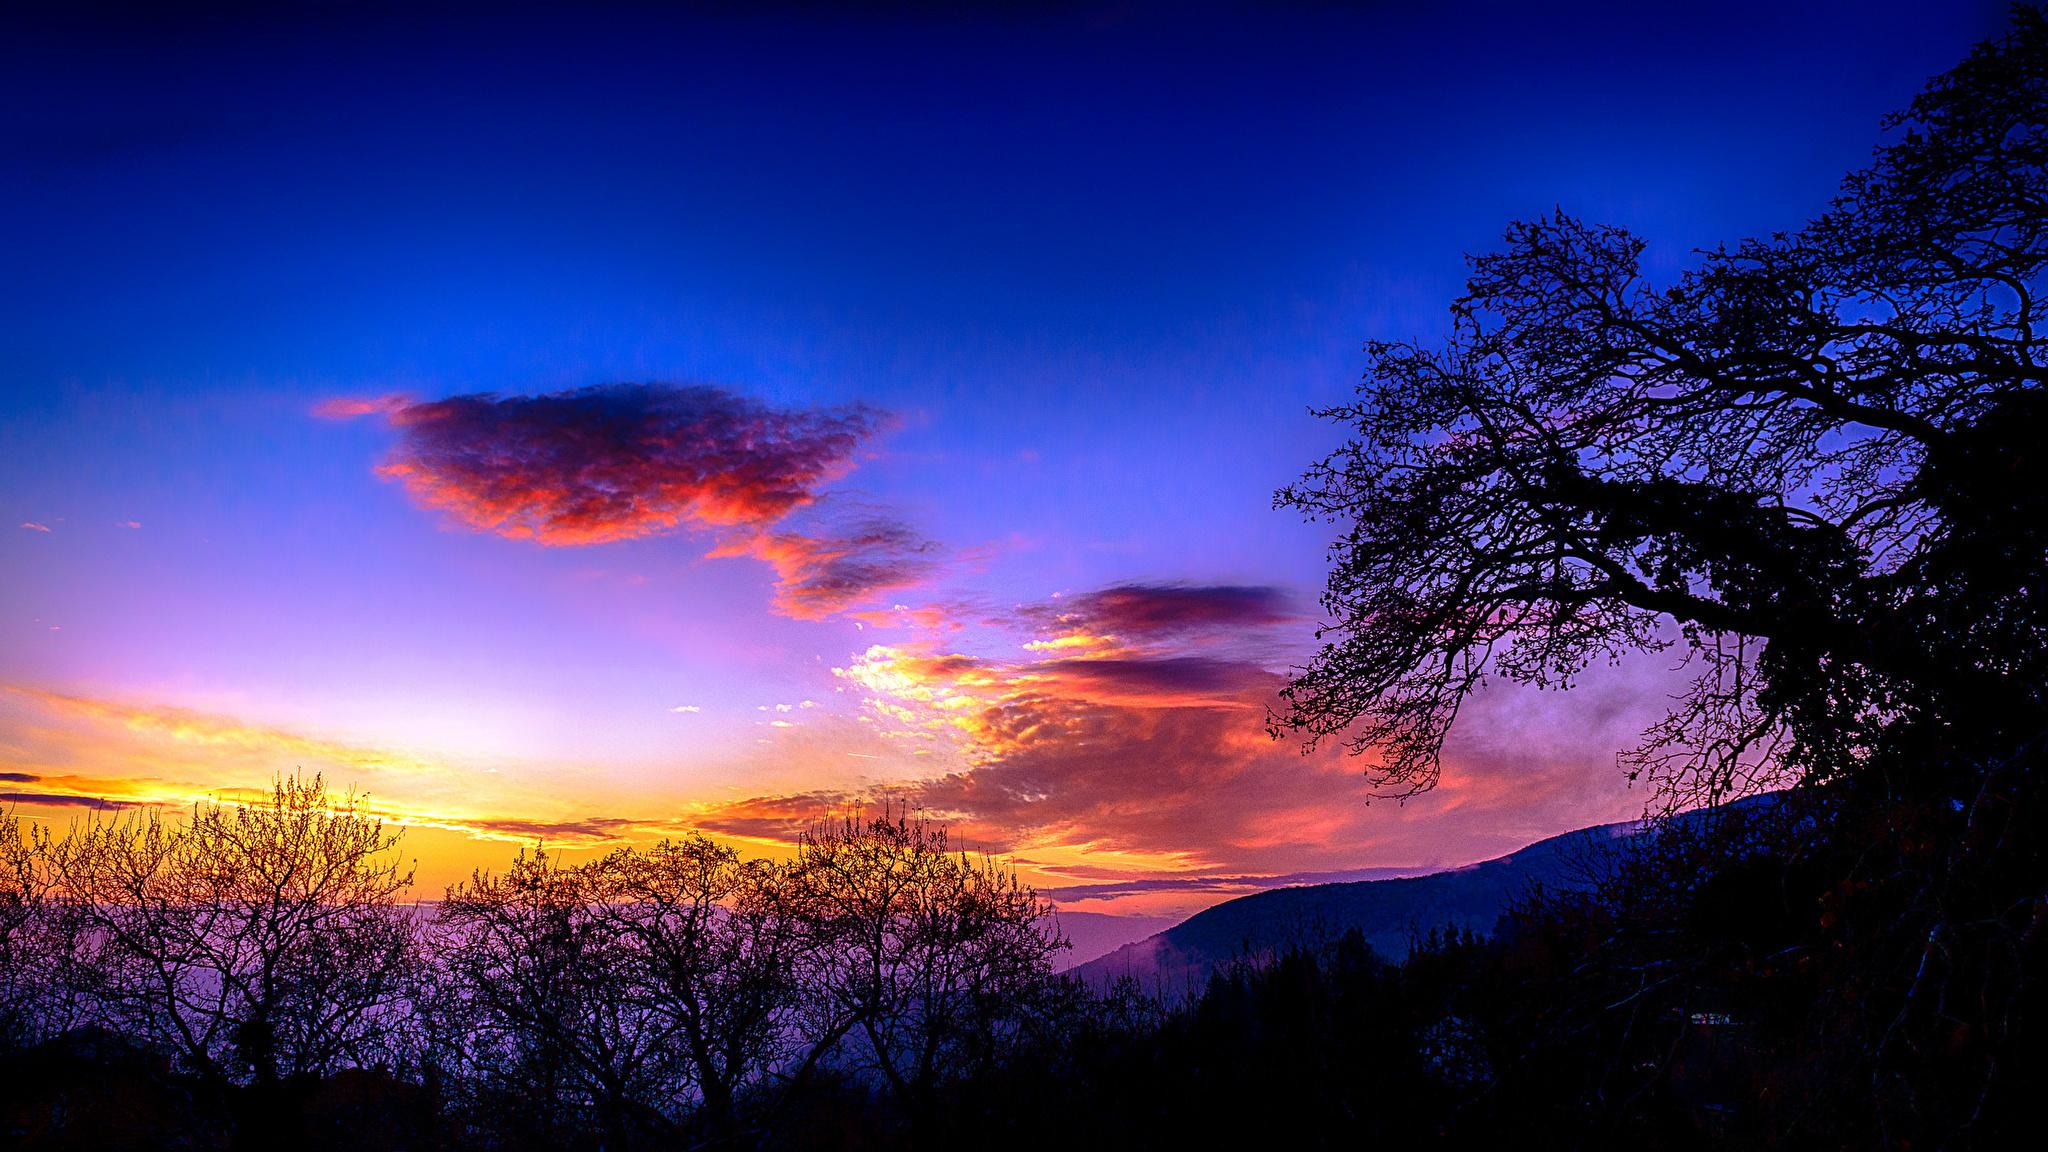 закат небо горы деревья онлайн